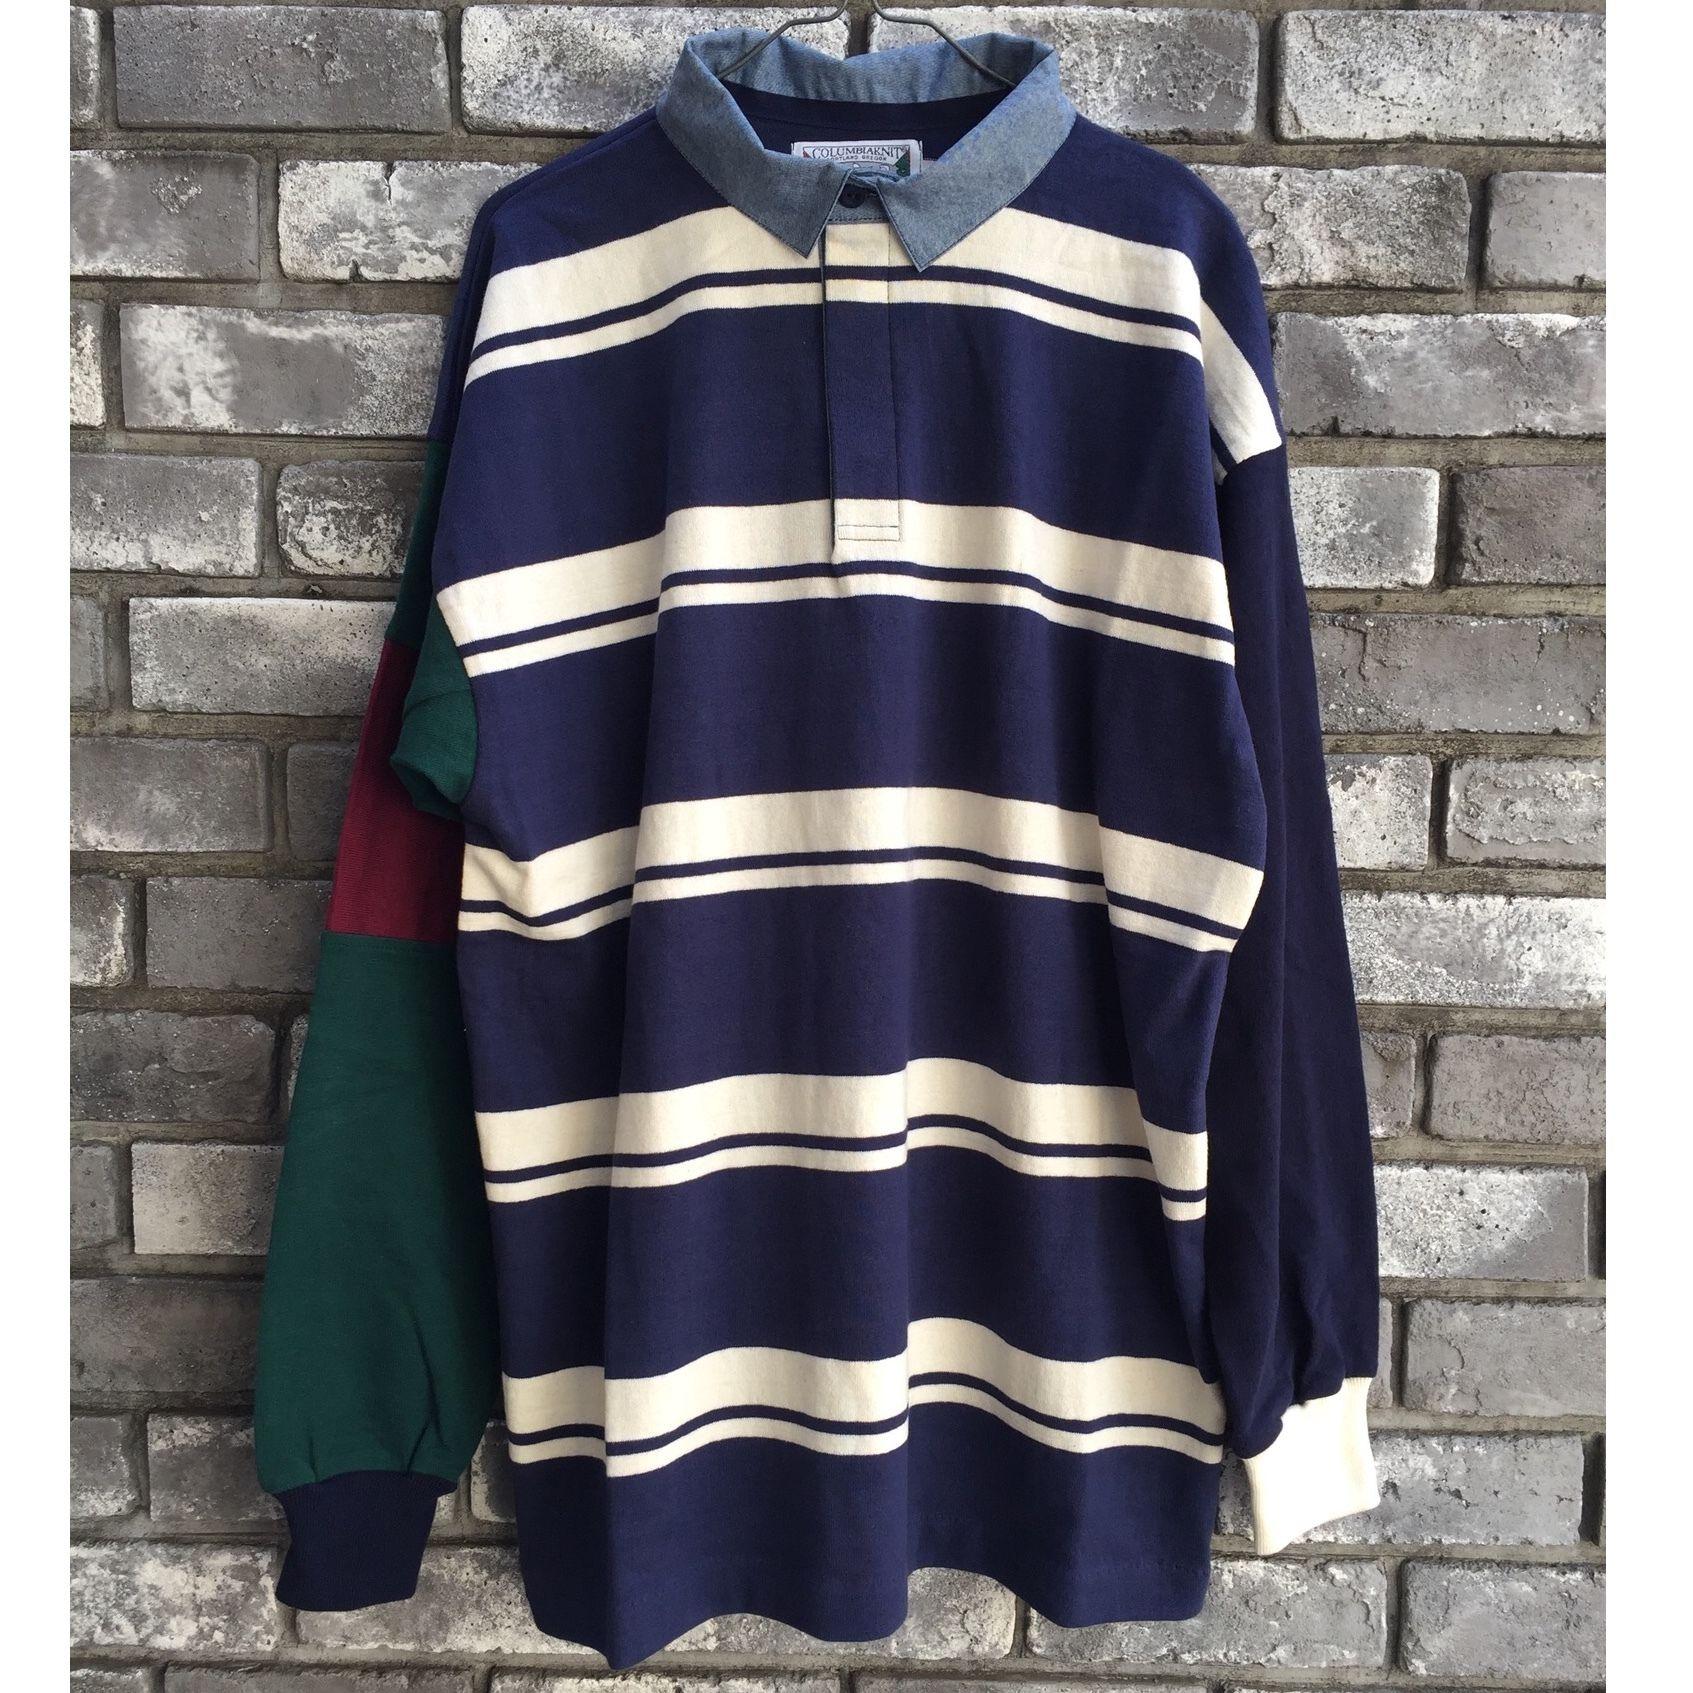 【COLUMBIA KNIT】1000pj practic rugby shirt  Lサイズ